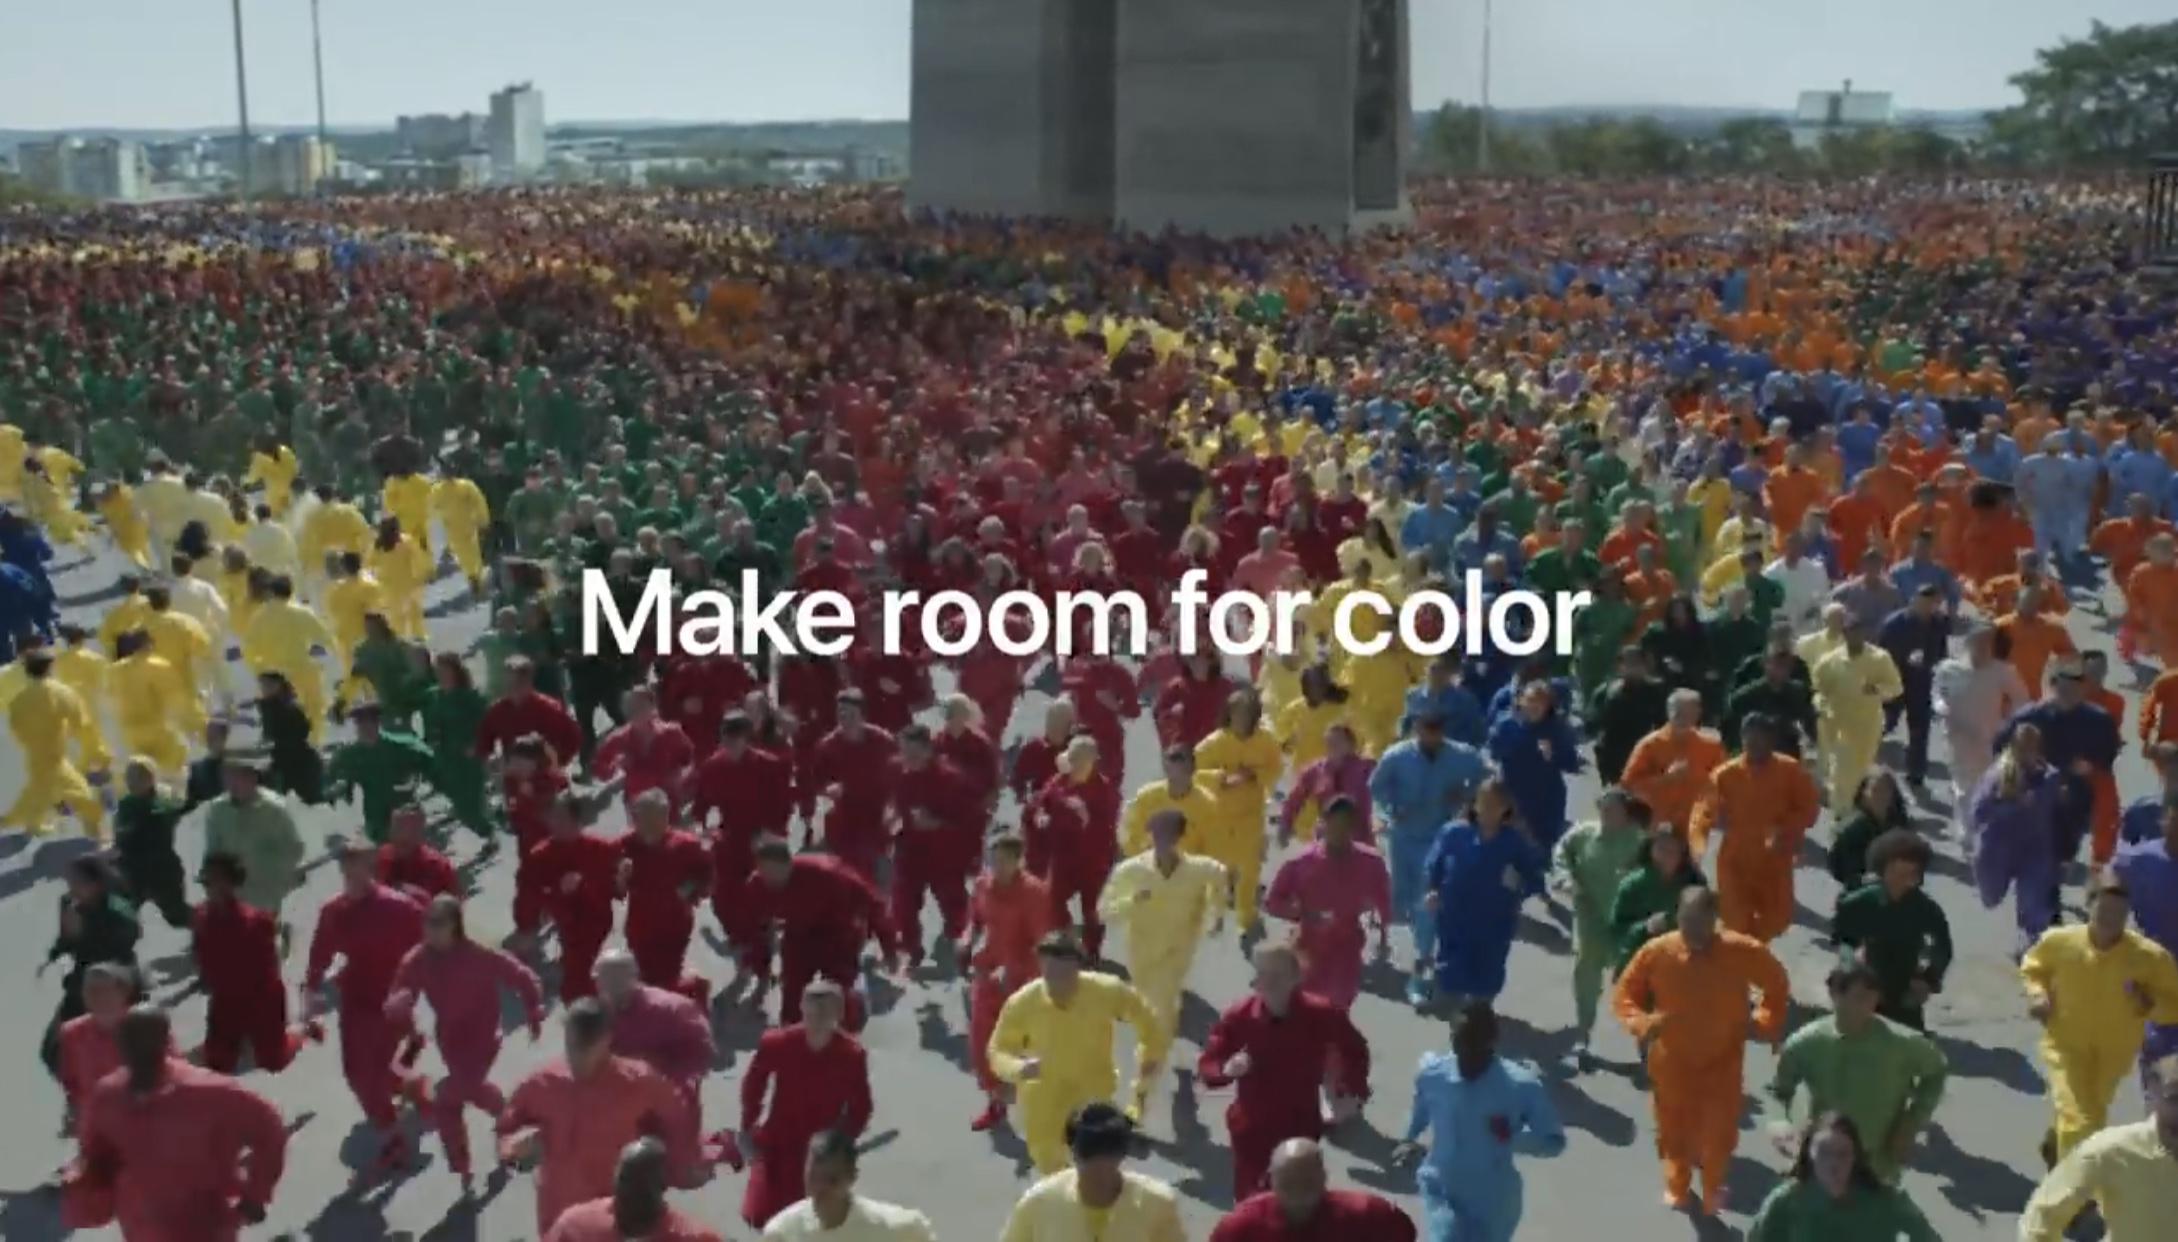 Apple выпустила эффектную рекламу iPhone XR